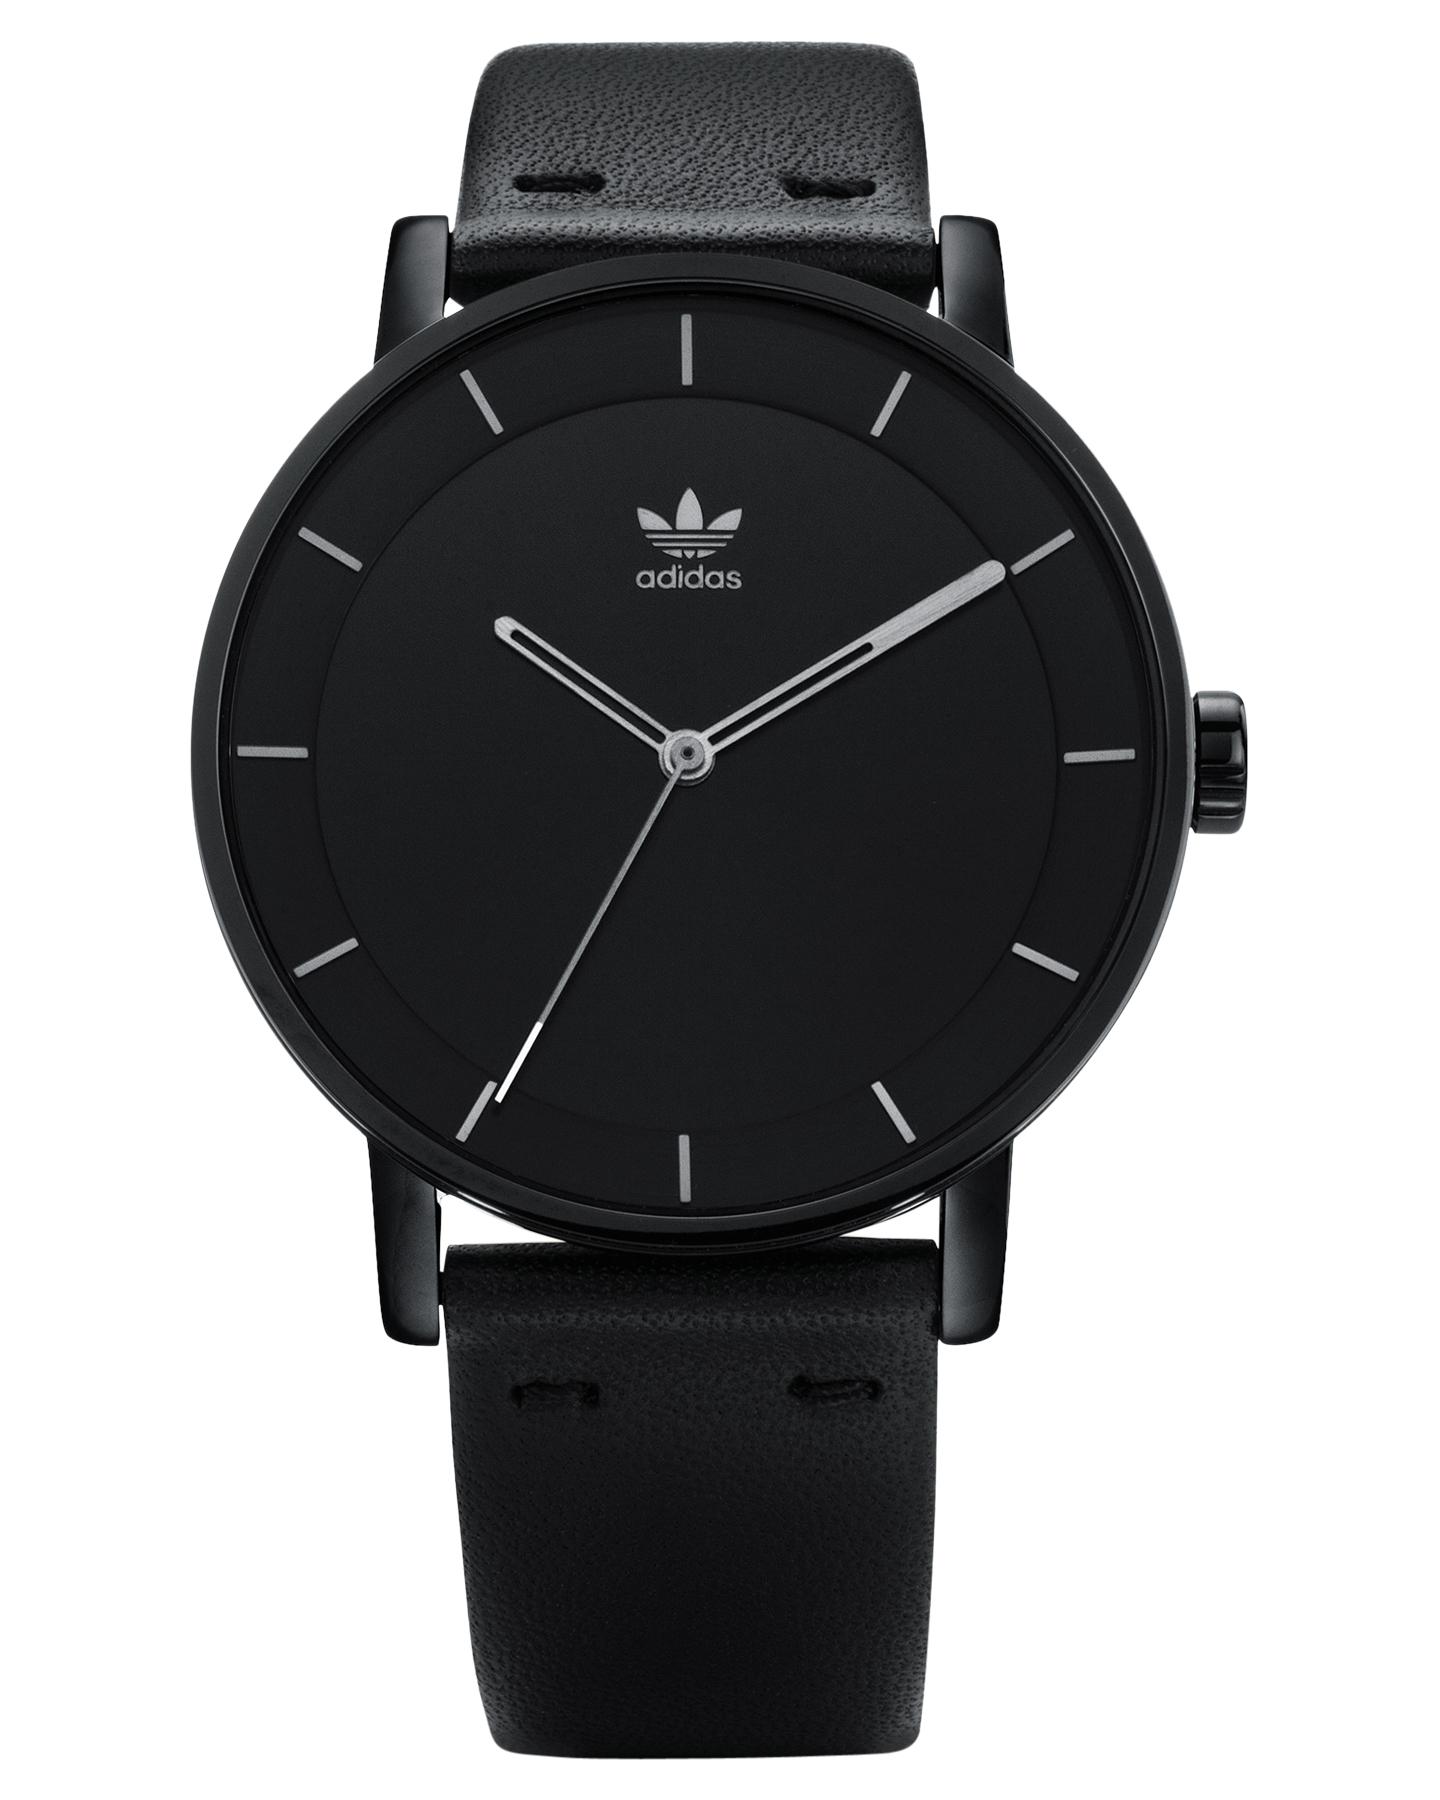 Adidas District L1 Watch - All Black